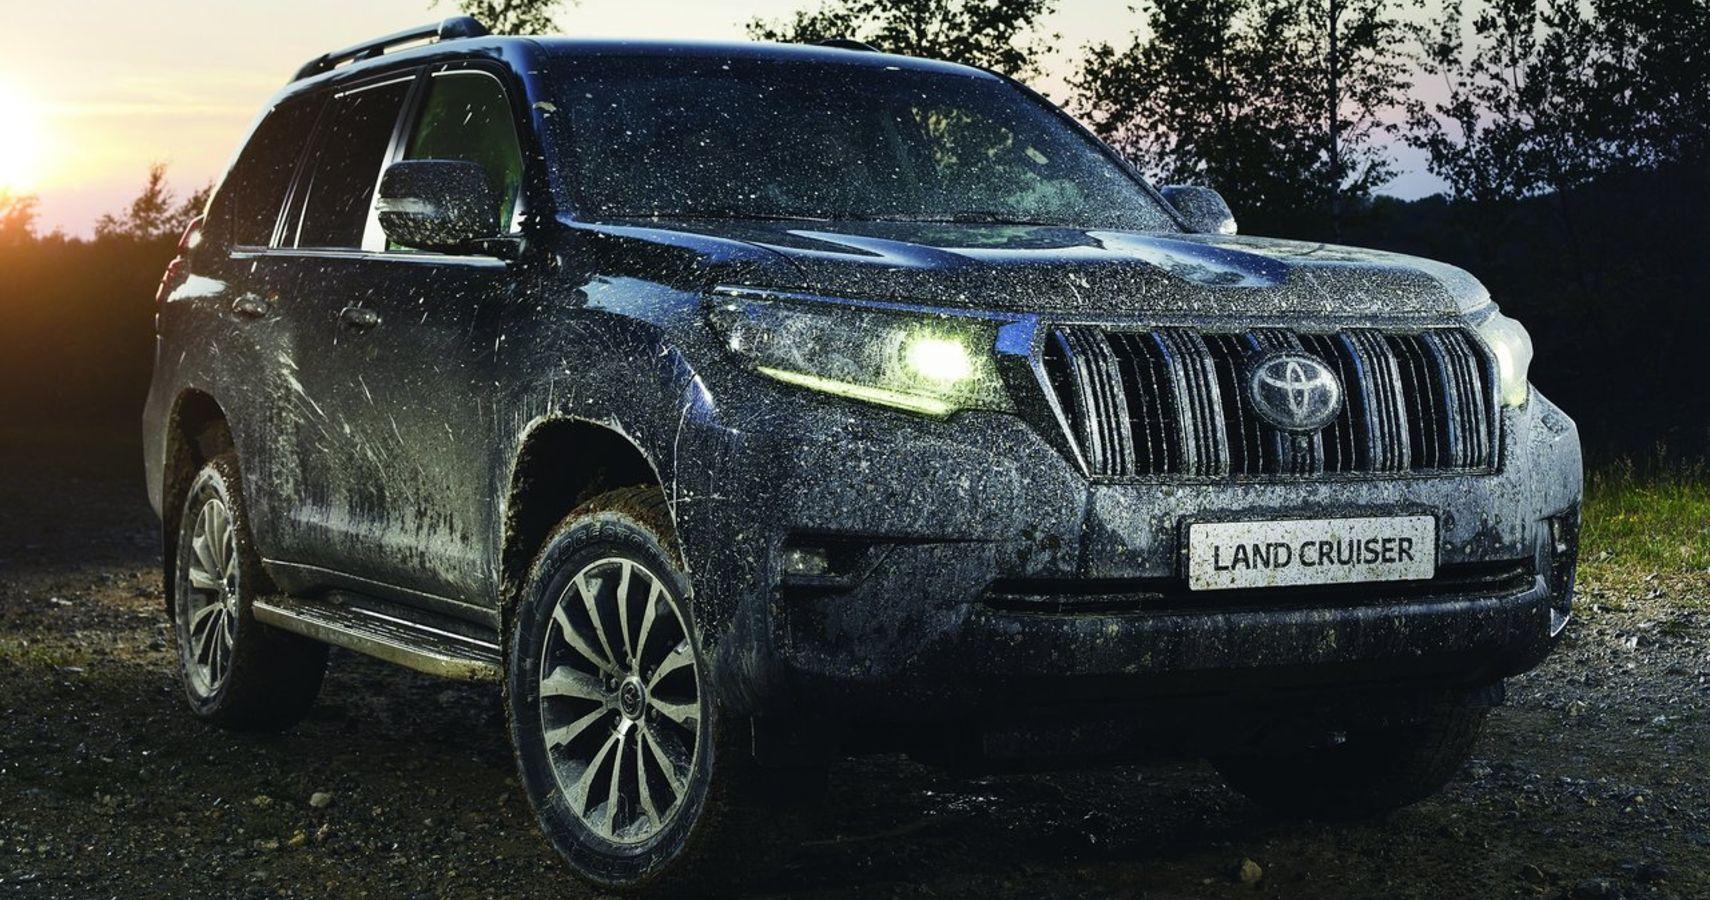 Toyota Land Cruiser: A Bulletproof SUV | HotCars